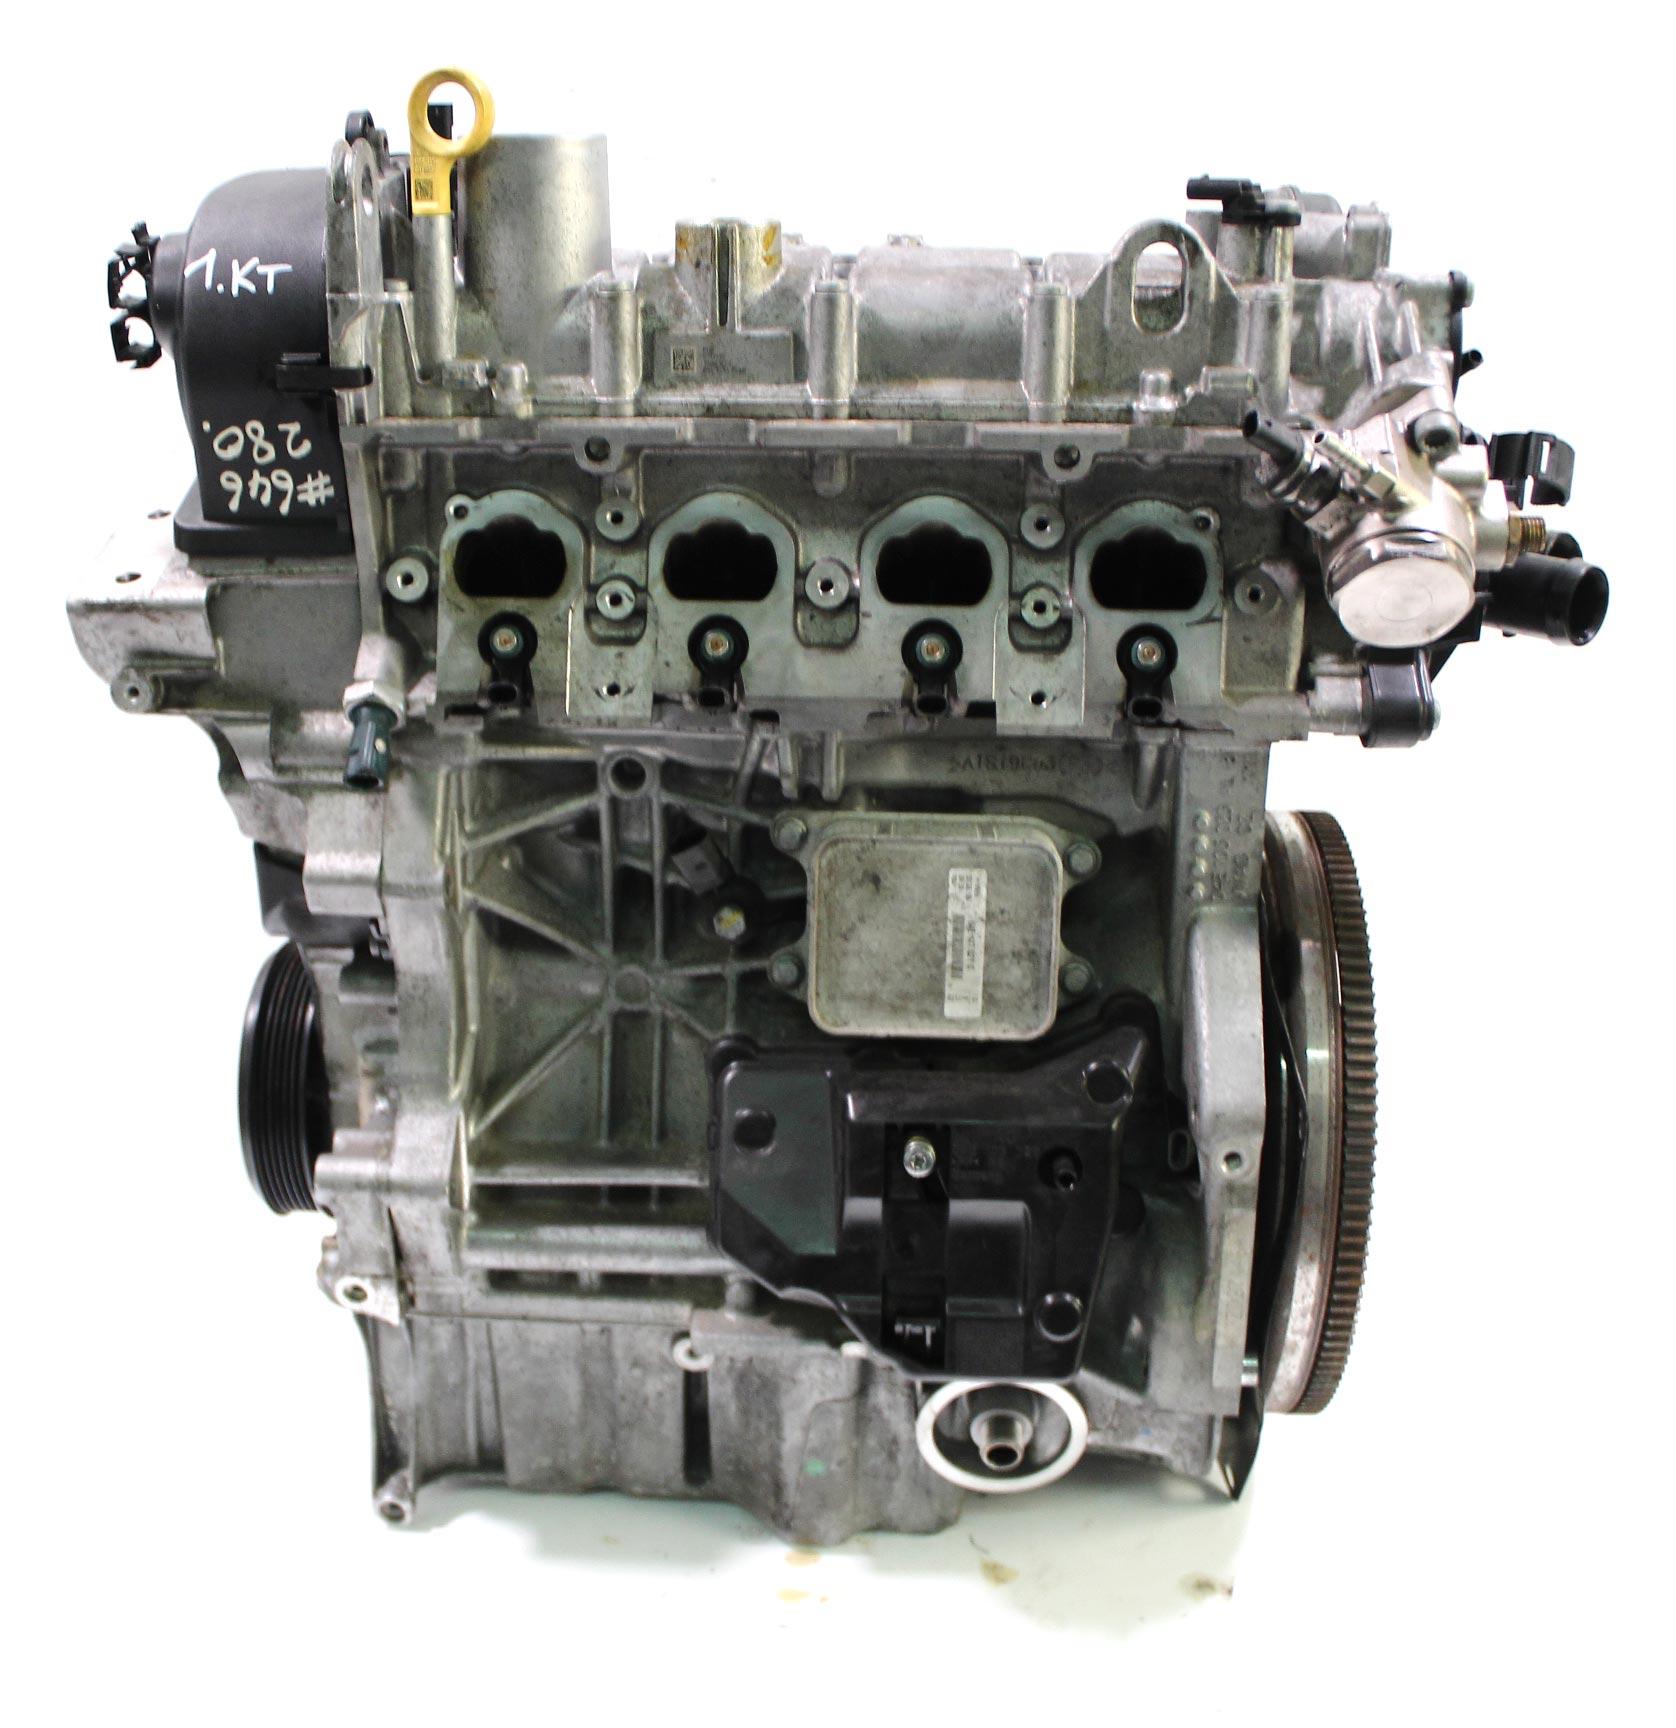 Motor 2016 Audi Seat Skoda VW 1,2 TFSI Benzin CJZ CJZA CJZB CJZC CJZD